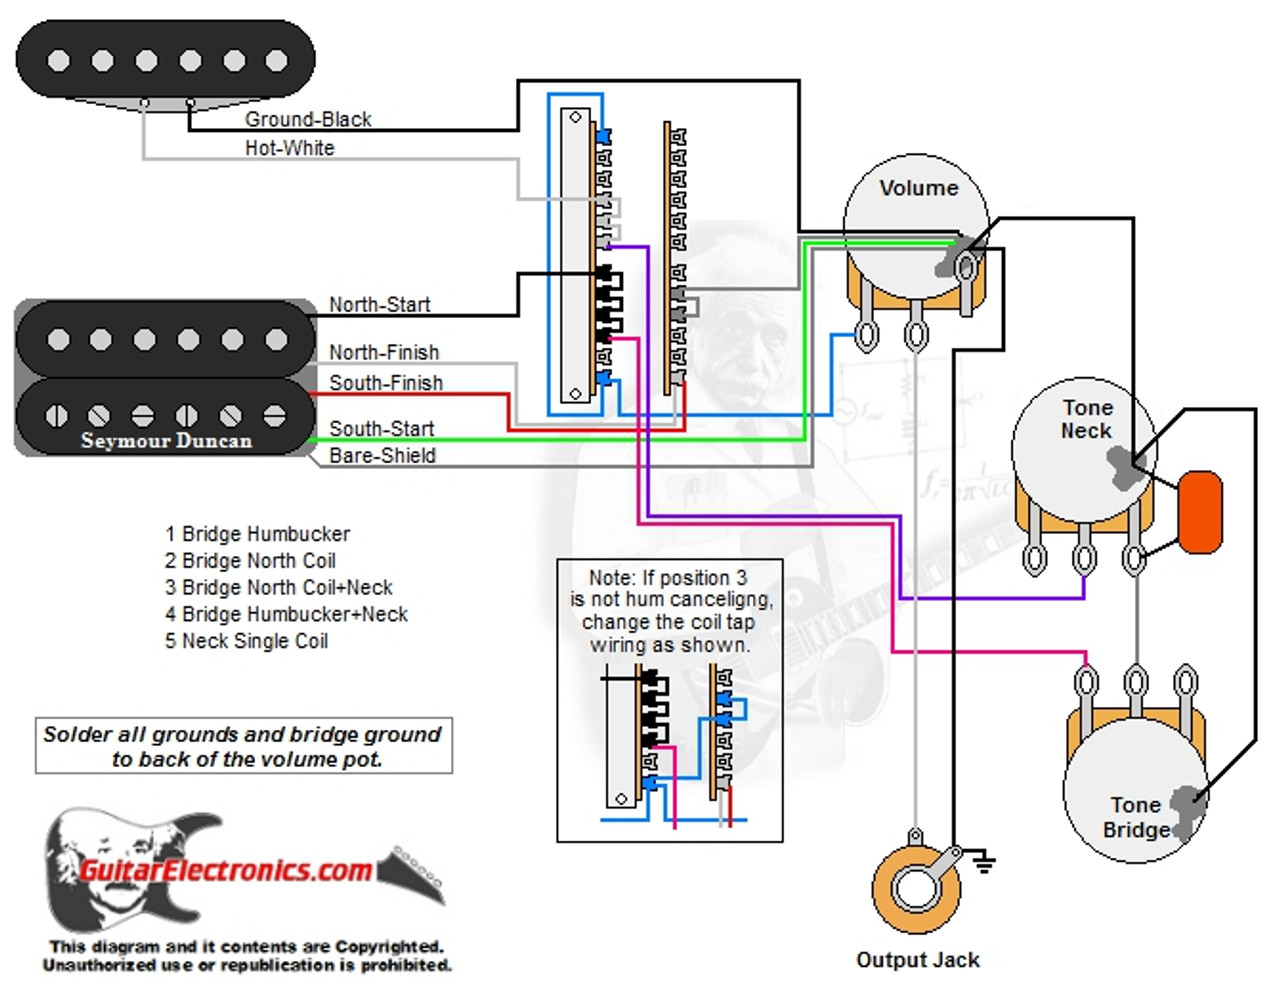 1 humbucker 1 single coil 5 way lever switch 1 volume 2 tones 011 humbucker 1 single coil 5 way lever 1 volume 2